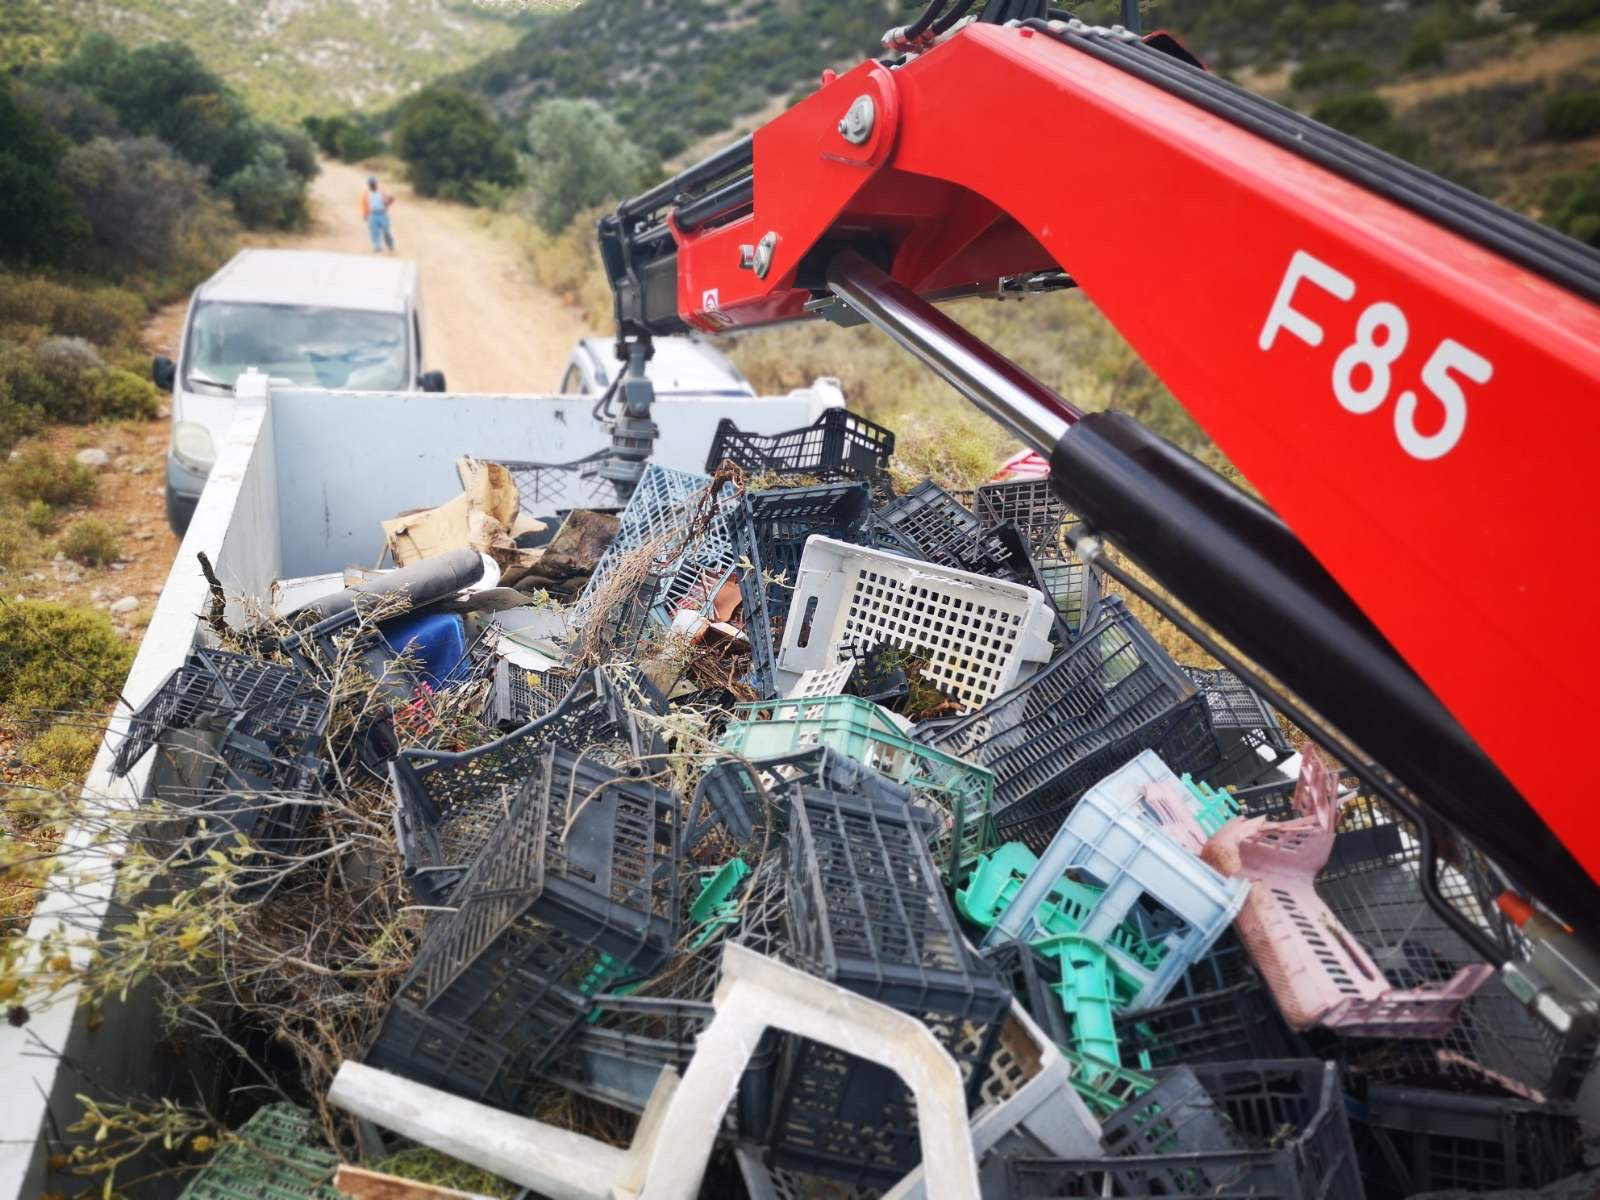 O Υμηττός θα γίνει το πρώτο «Zero Plastic» βουνό της Ελλάδας